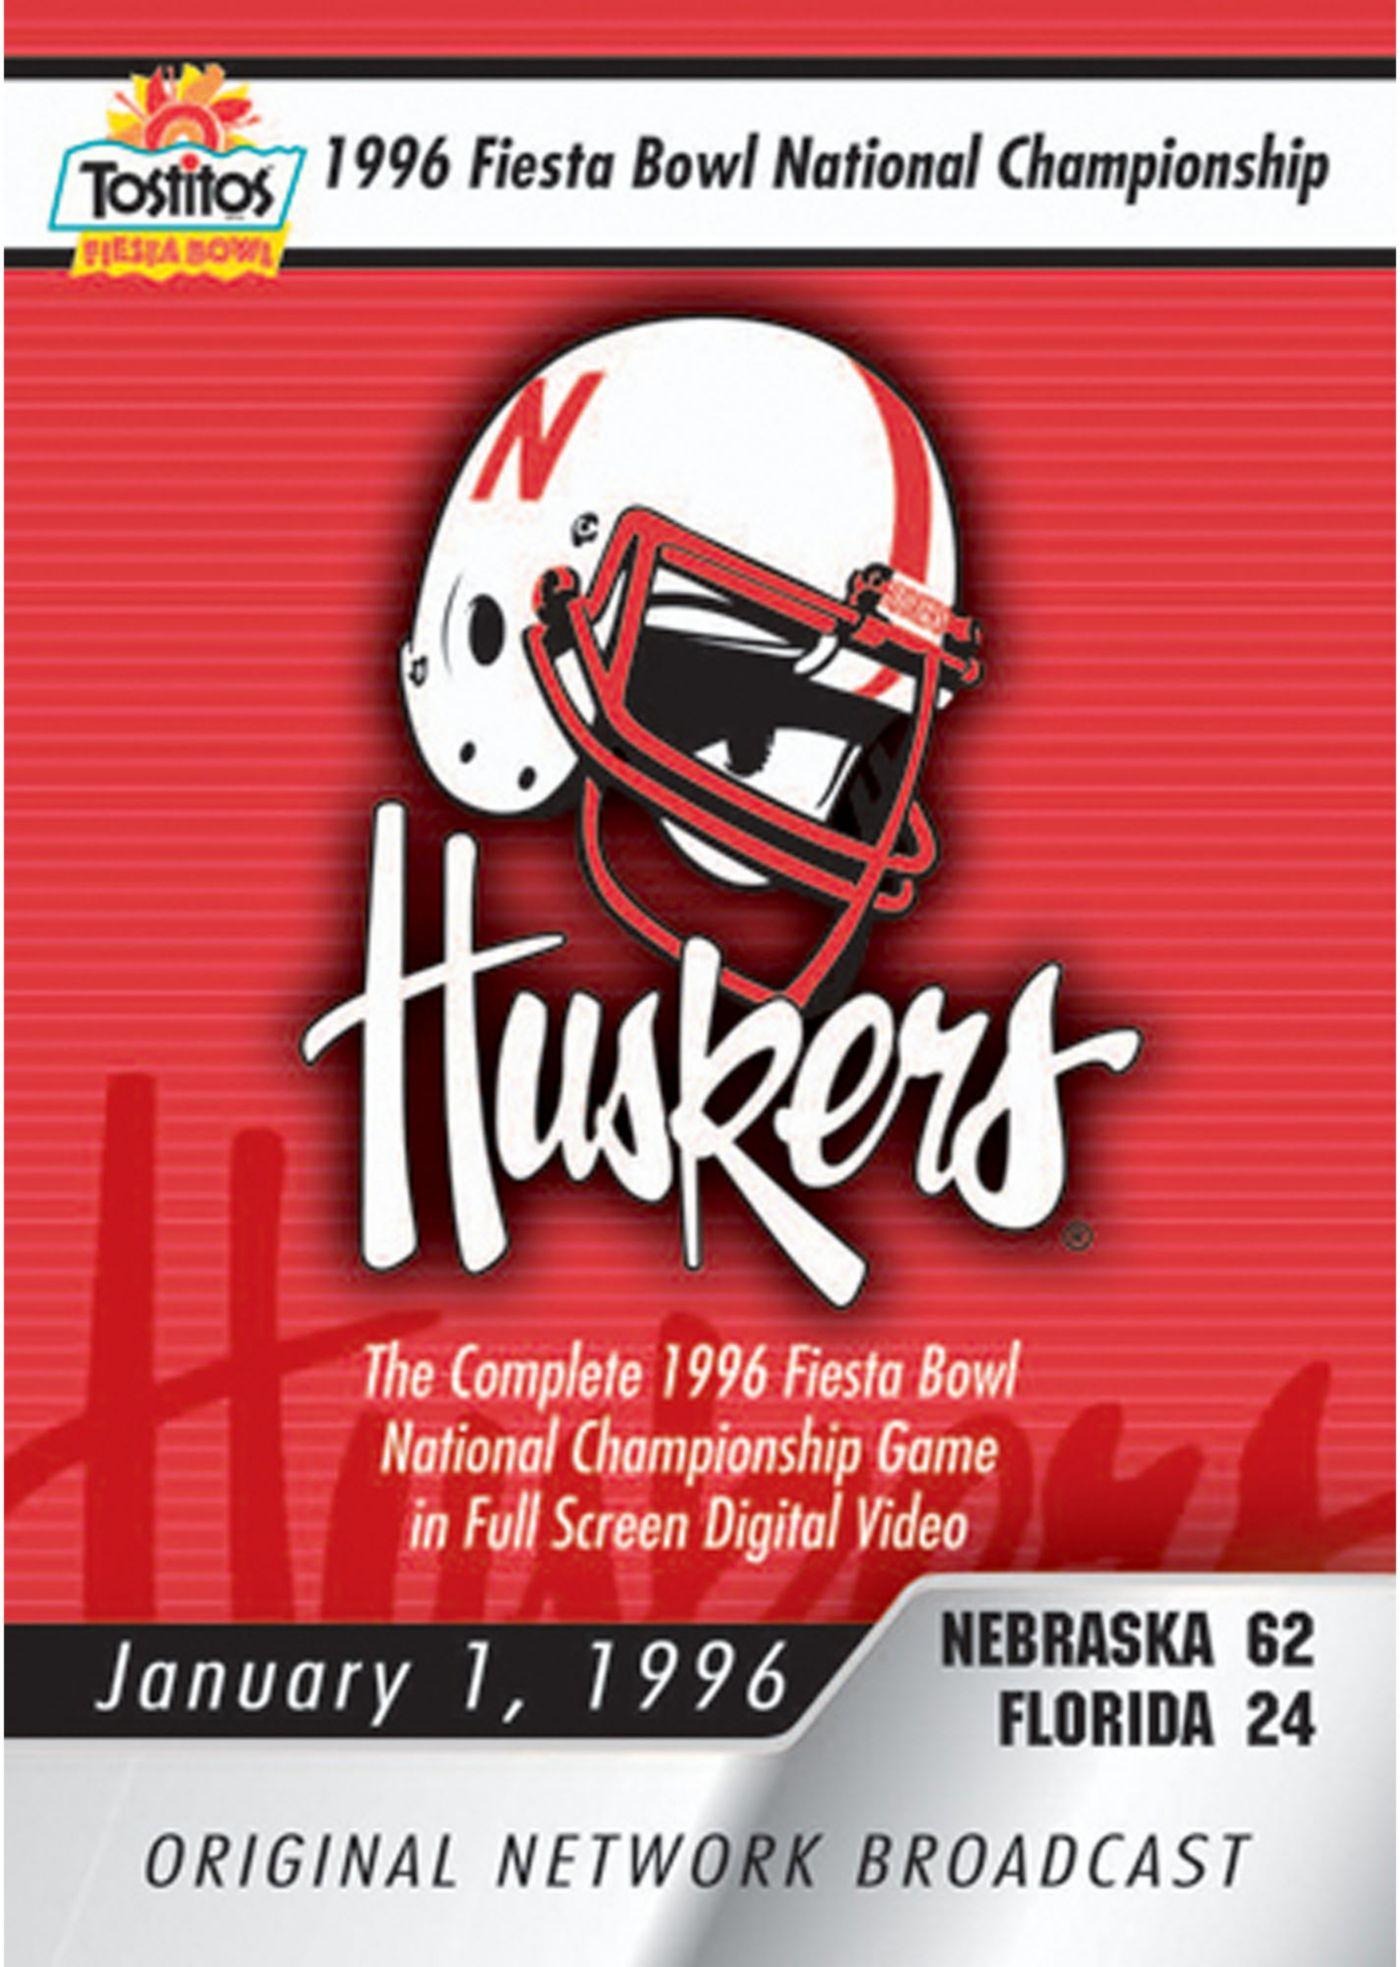 1996 Tostitos Fiesta Bowl Game National Championship Game DVD